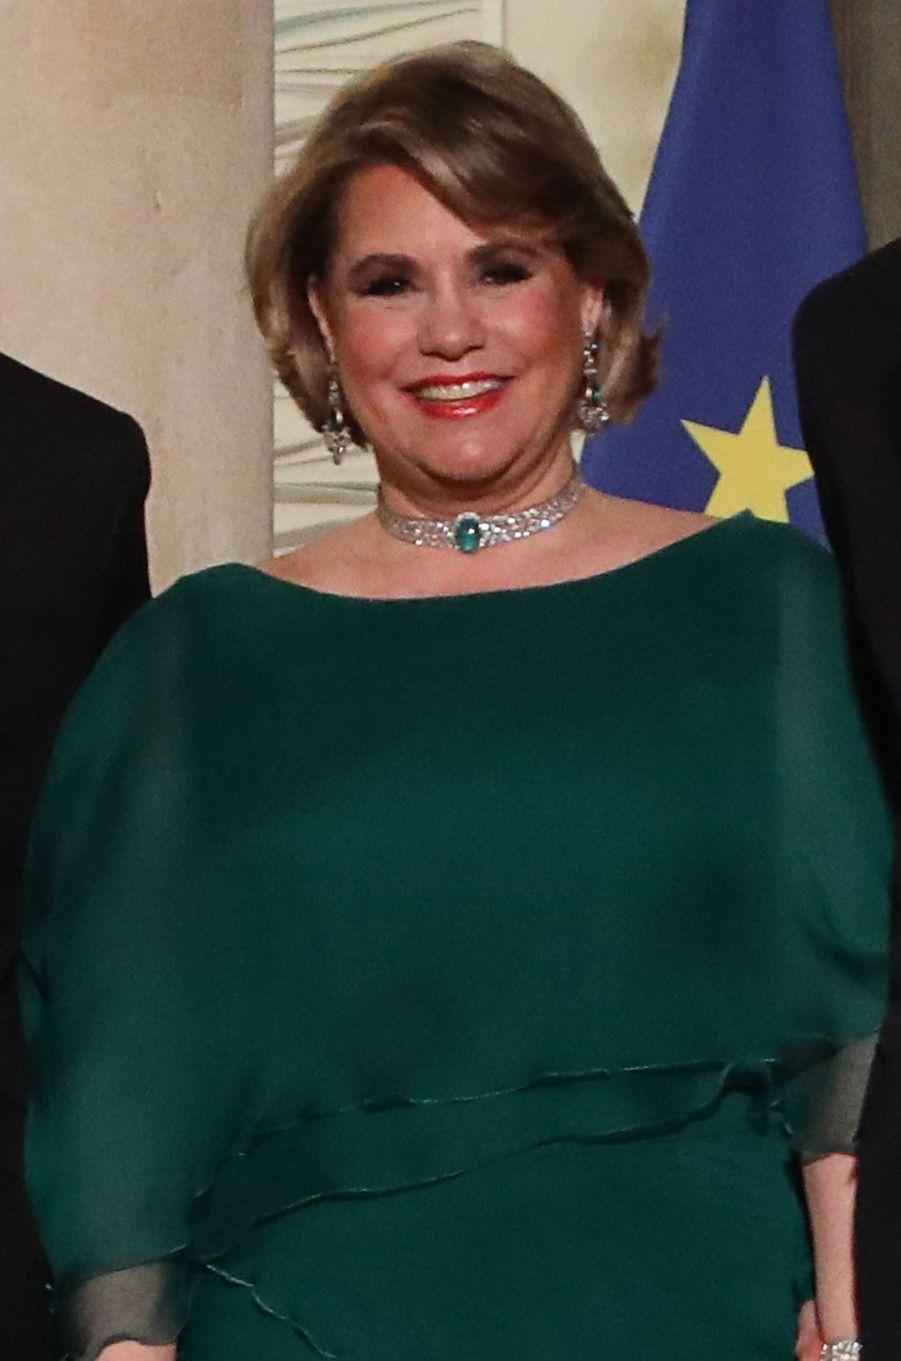 La grande-duchesse Maria Teresa de Luxembourg, le 19 mars 2018